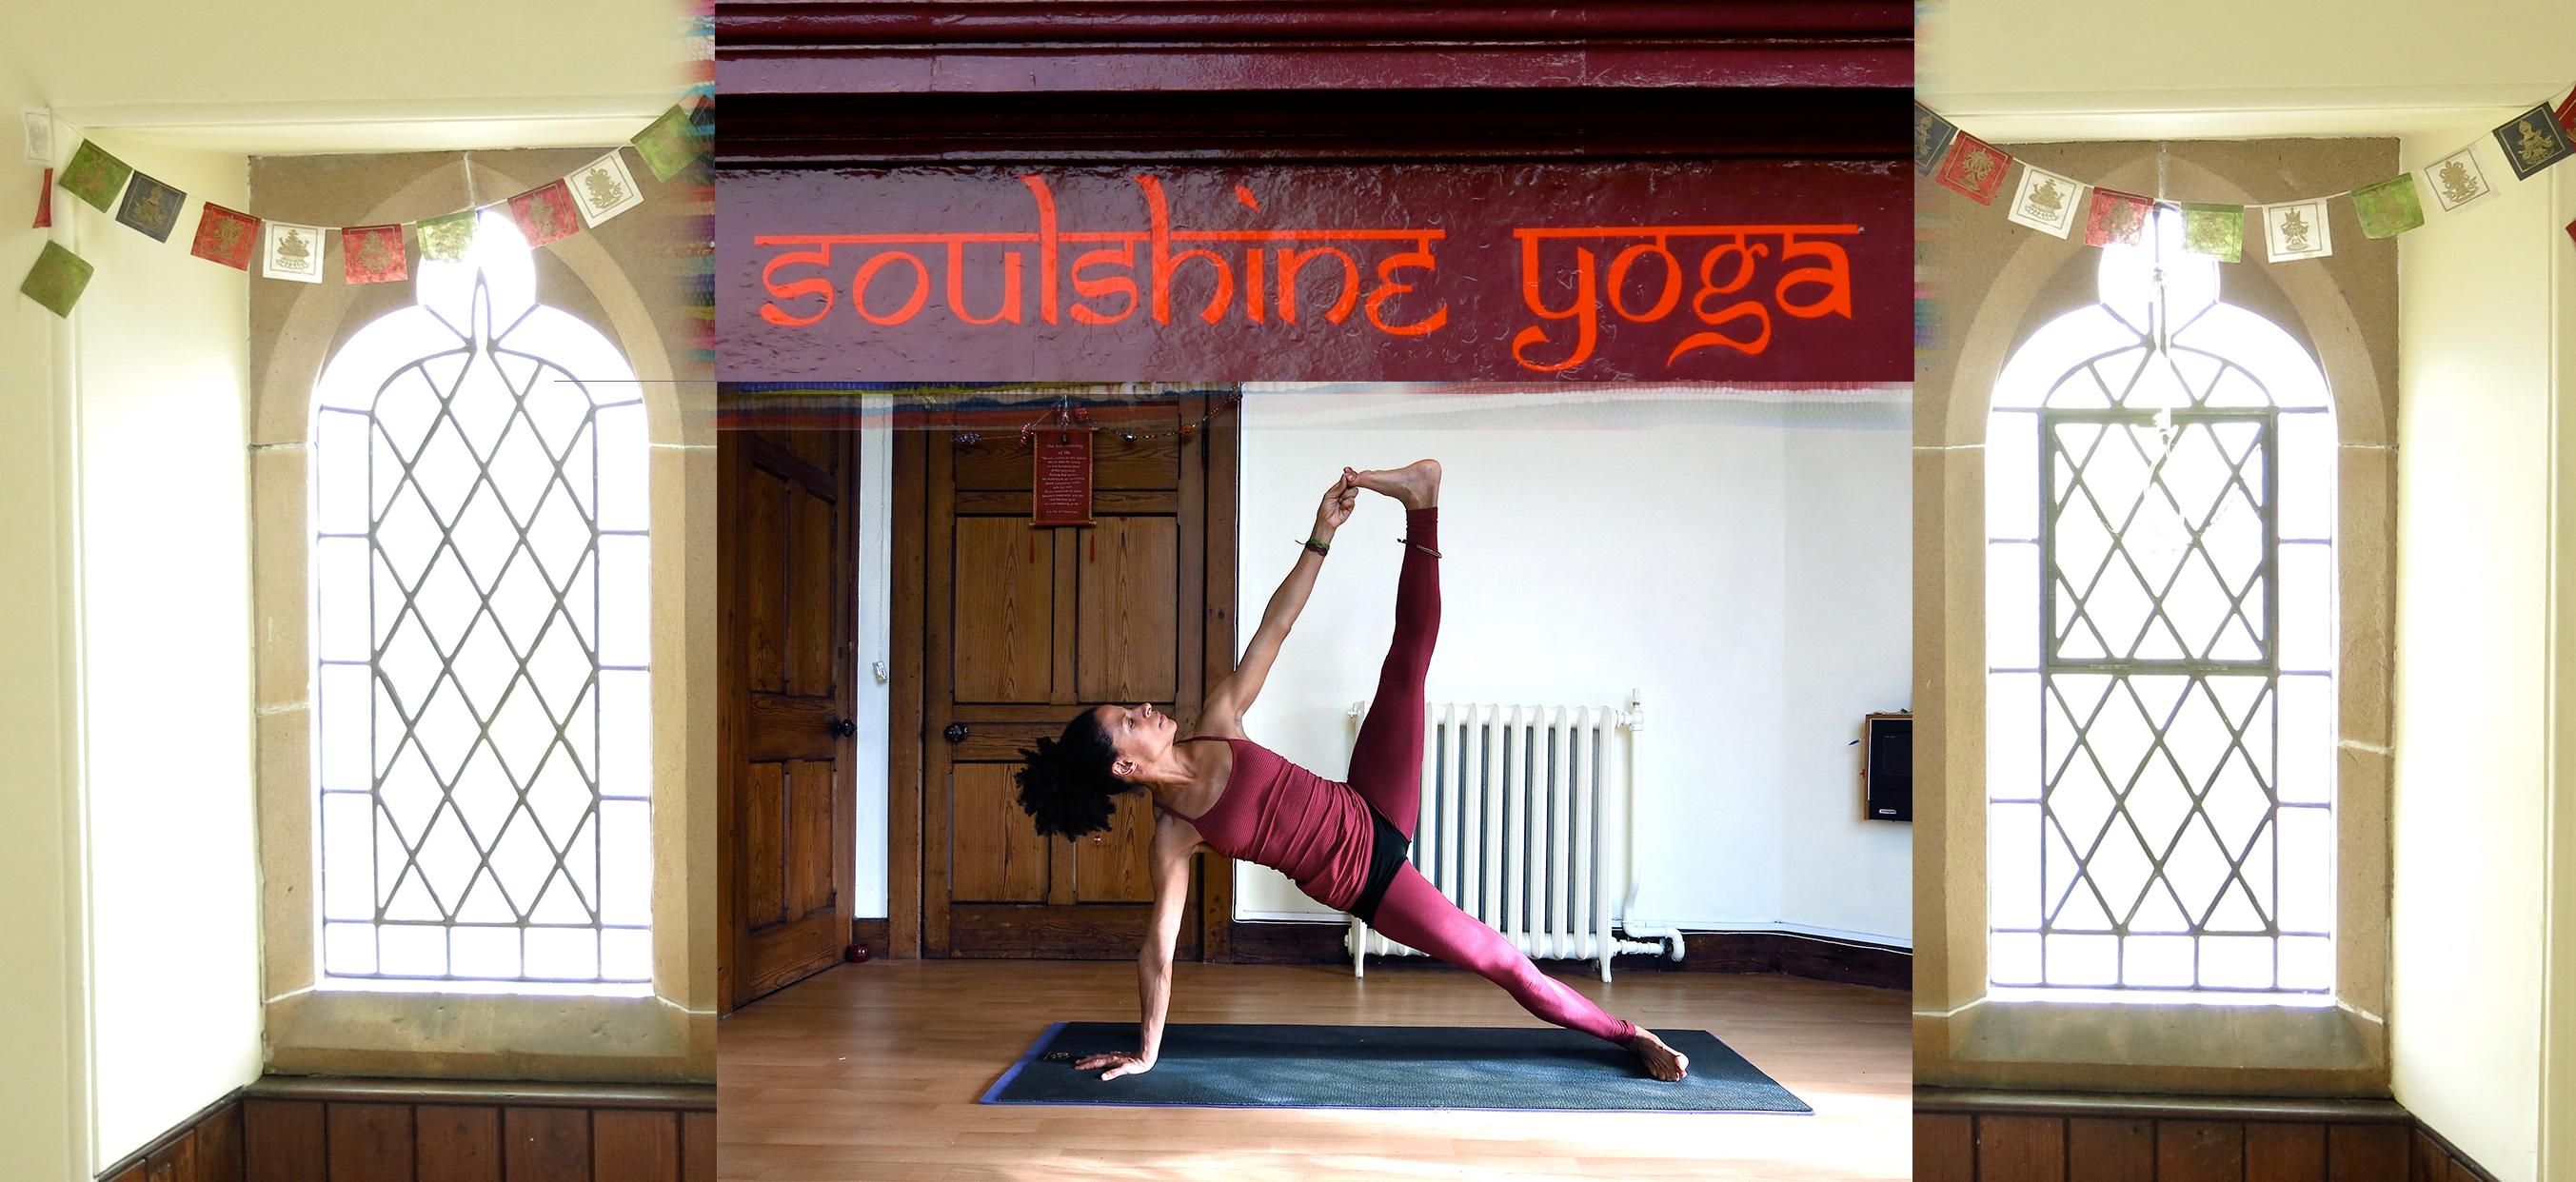 Soul Shine Yoga